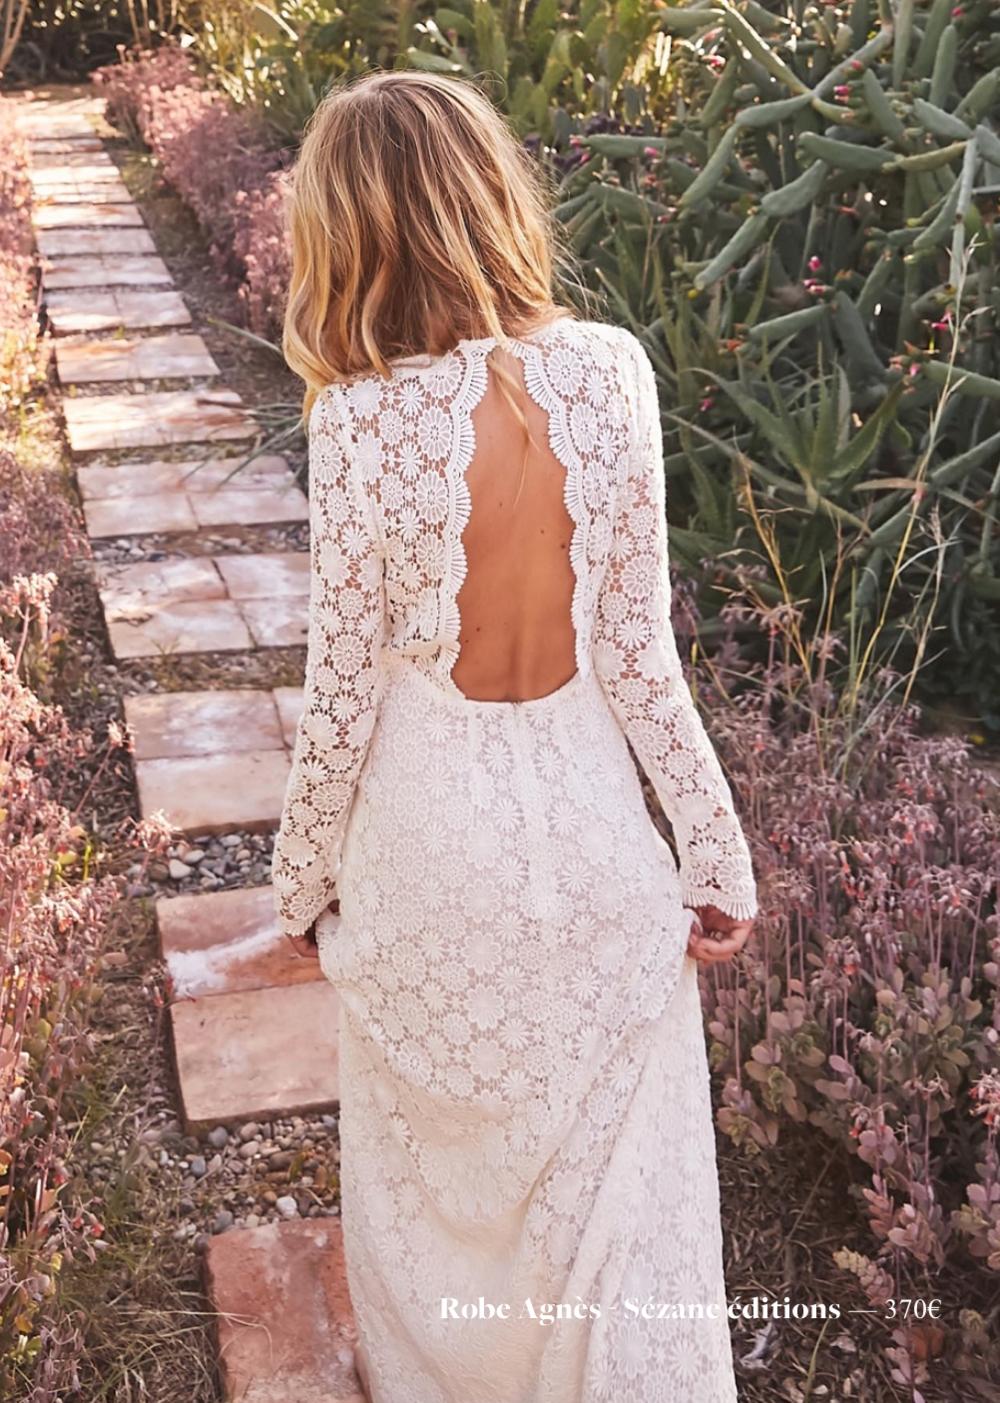 Trouver sa robe - A prix mini